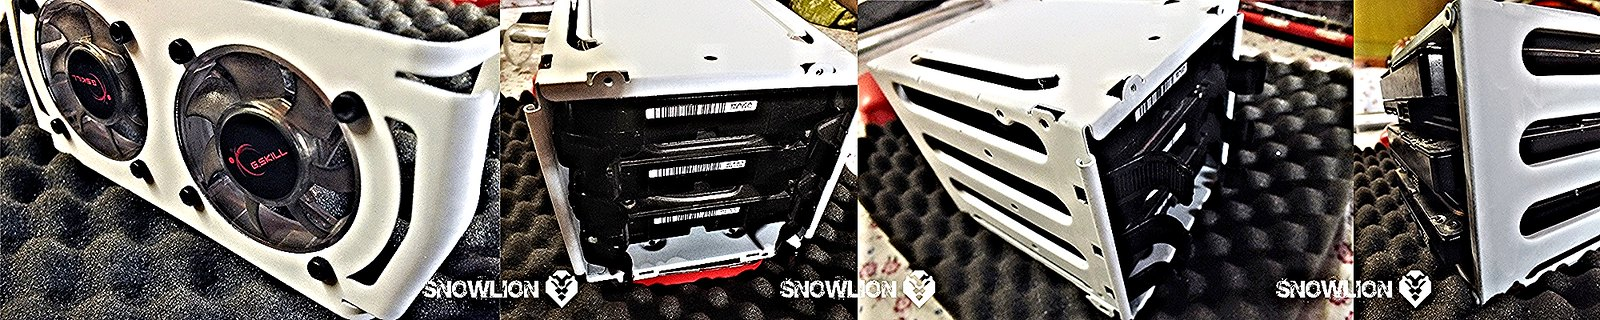 snowlion67